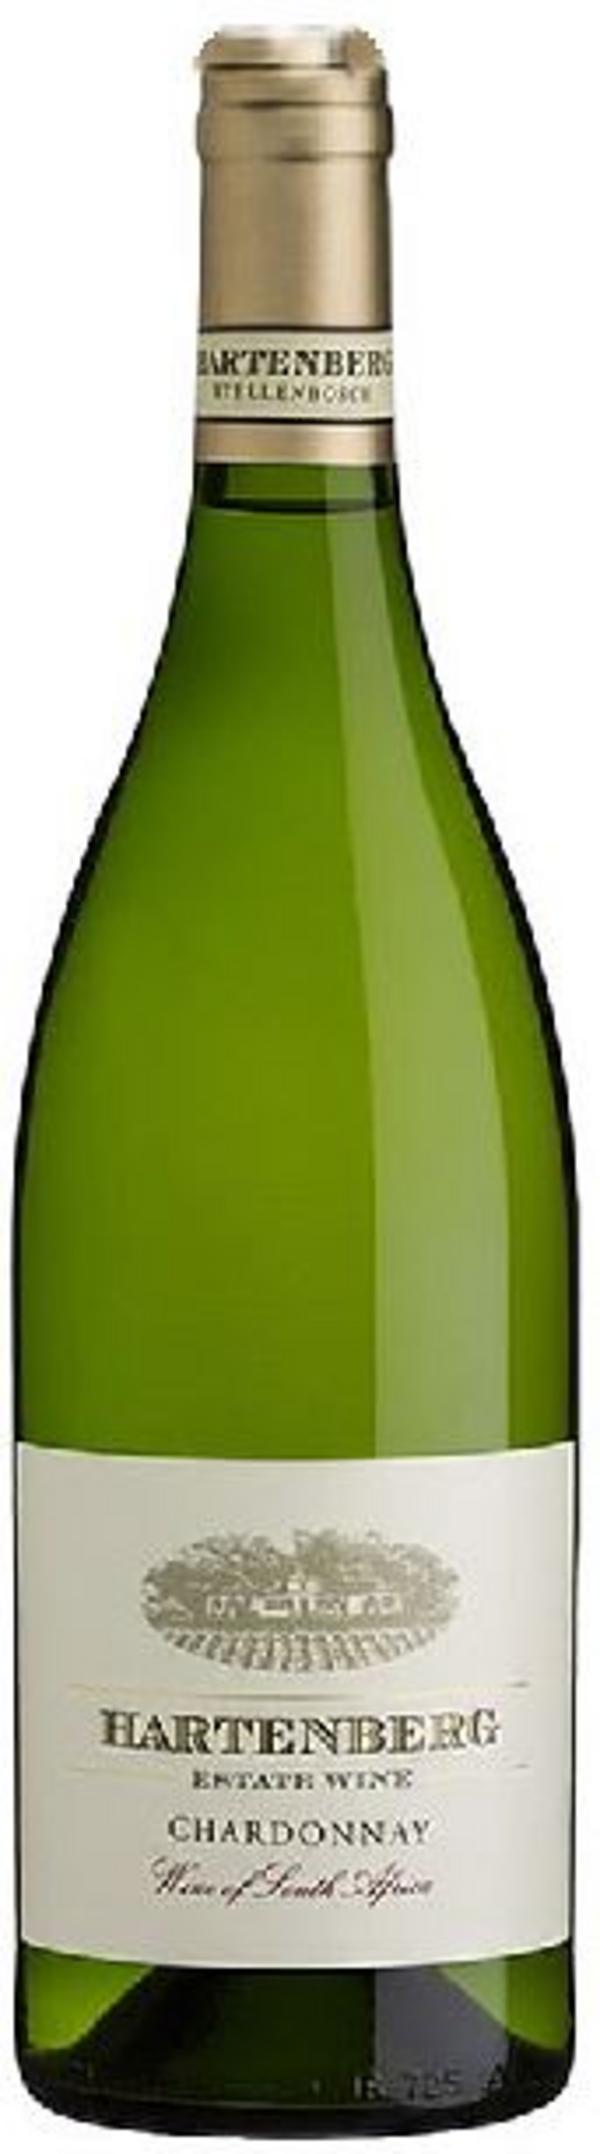 Hartenberg Chardonnay 2016.